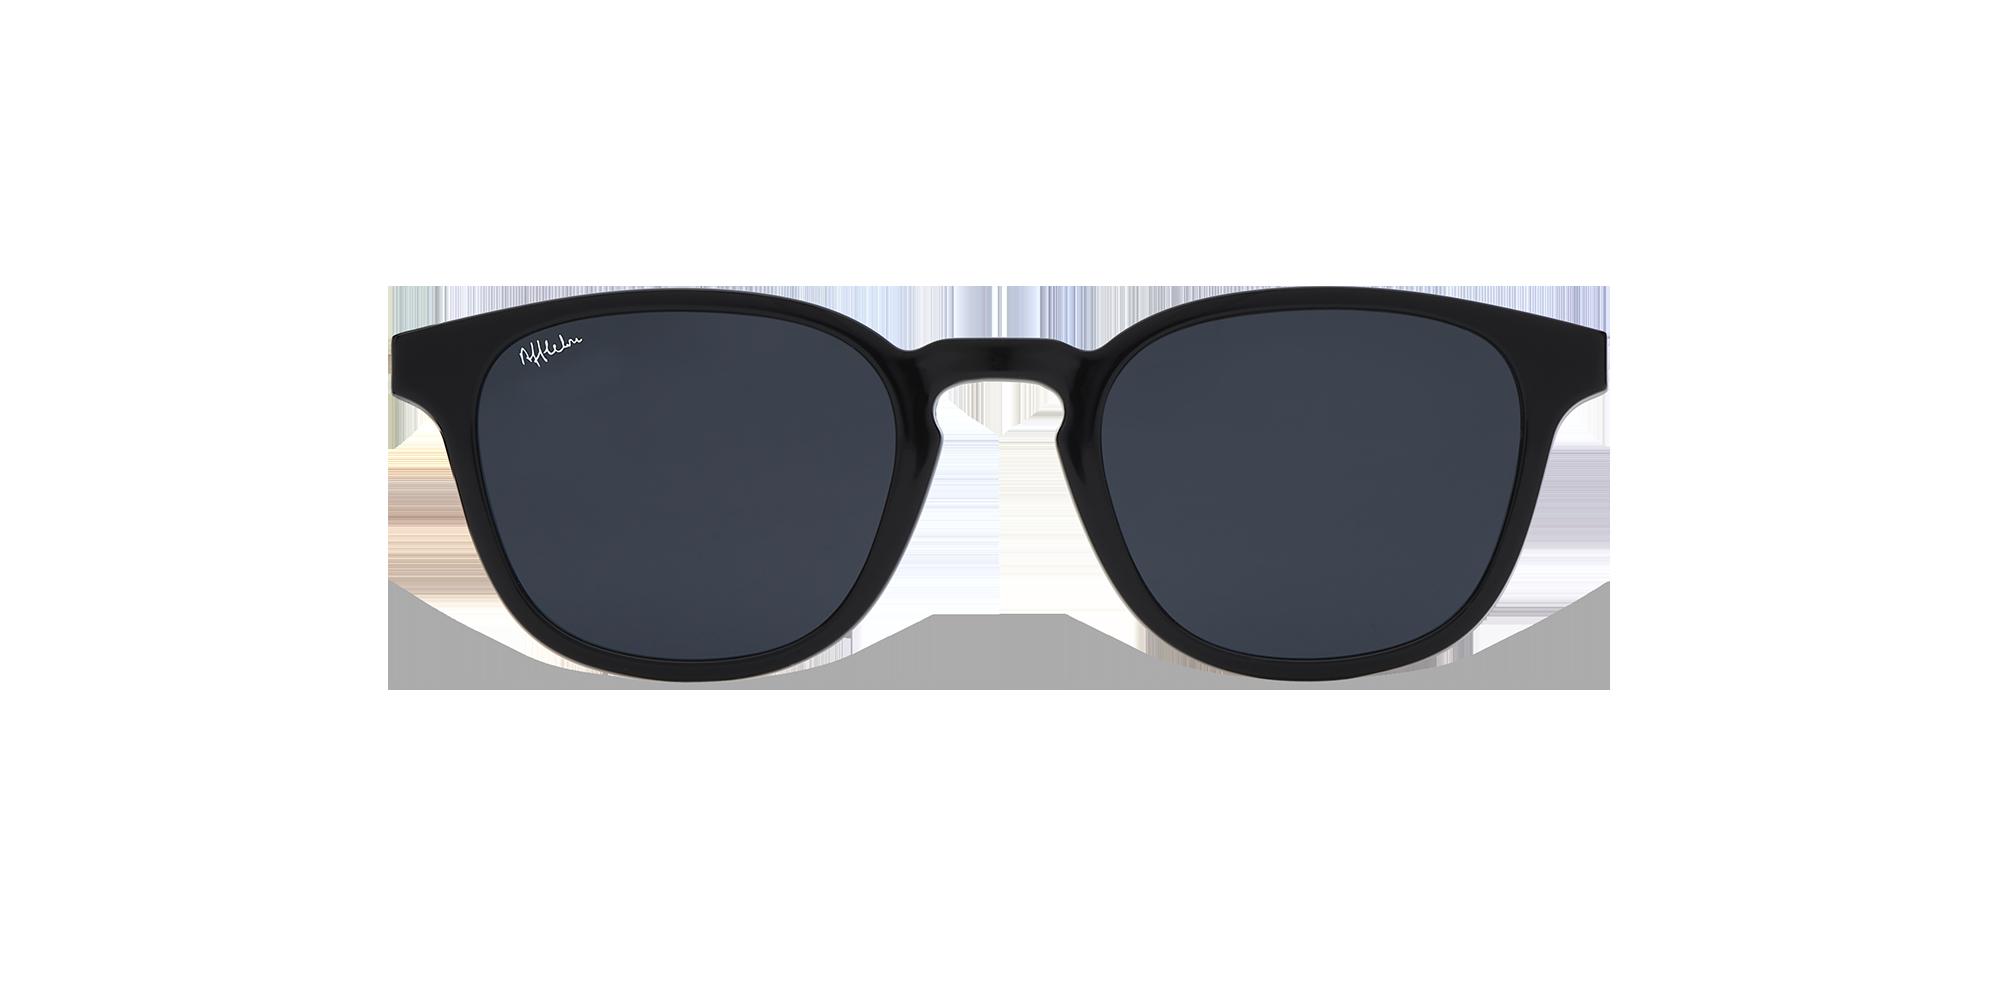 afflelou/france/products/smart_clip/clips_glasses/07630036429280_face.png